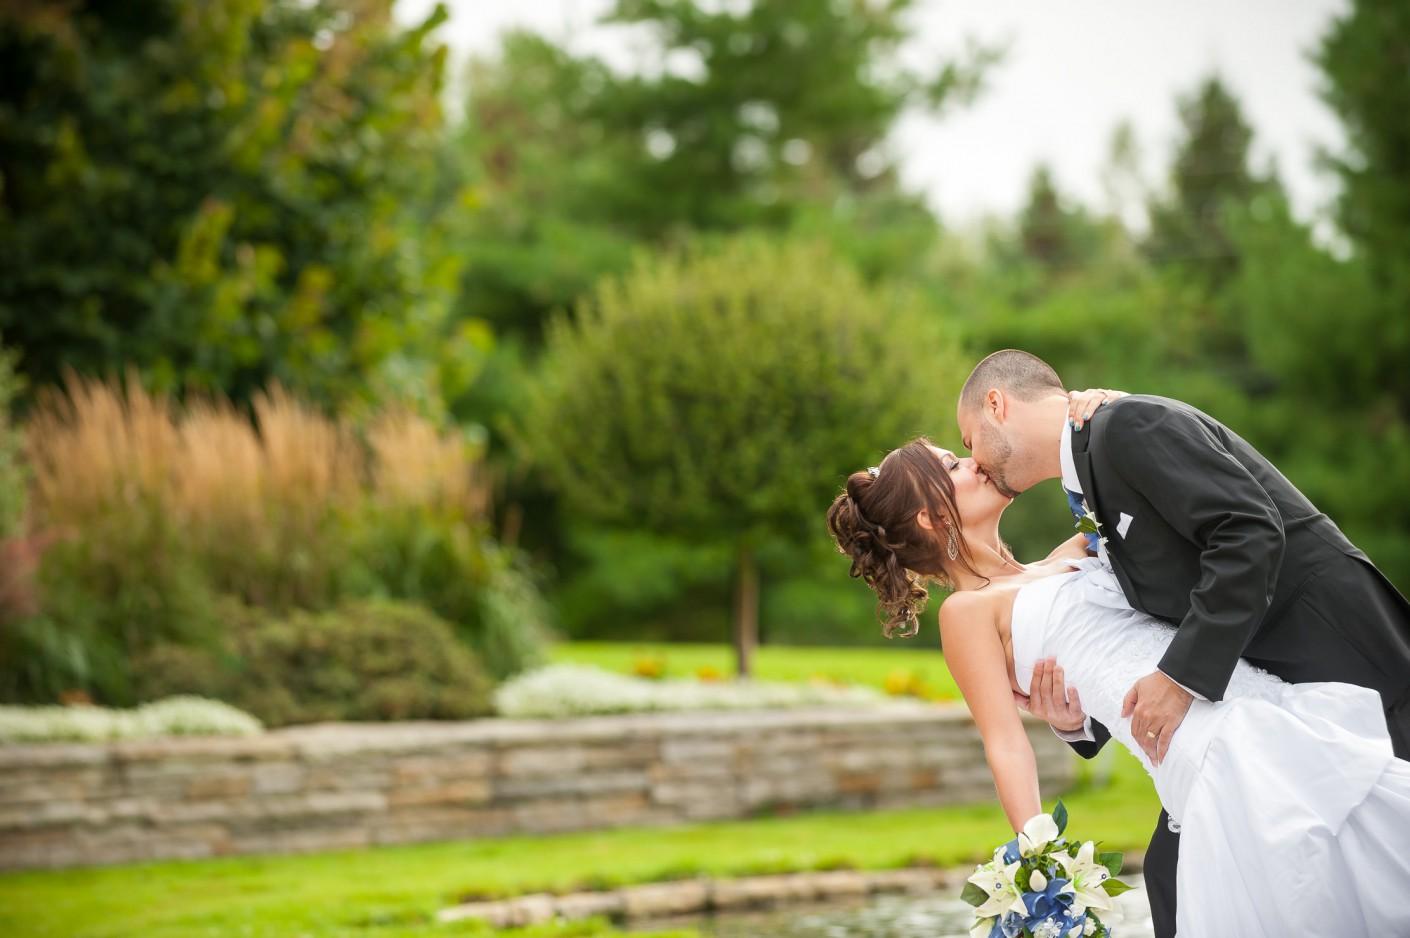 Mariage : Un mariage renversant -, KW: 6-PhotosCouple